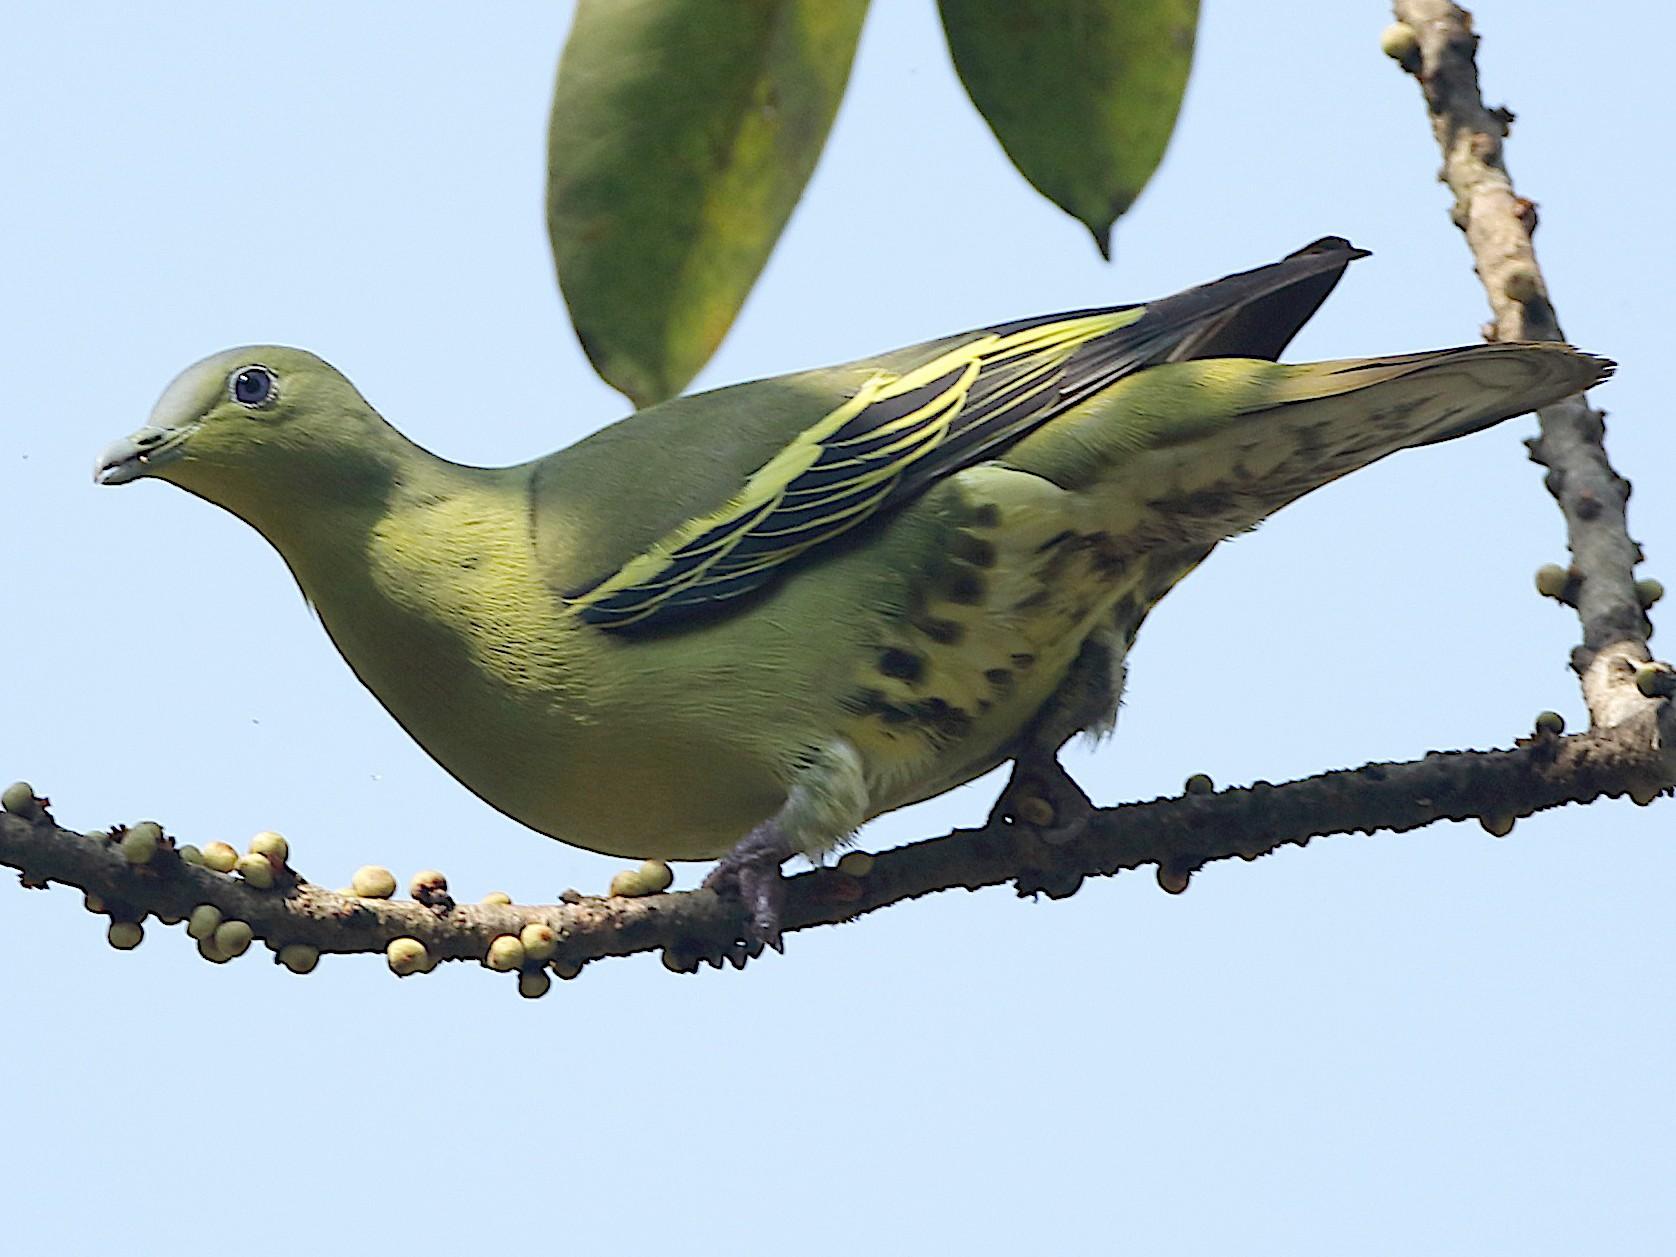 Gray-fronted Green-Pigeon - Savio Fonseca (www.avocet-peregrine.com)